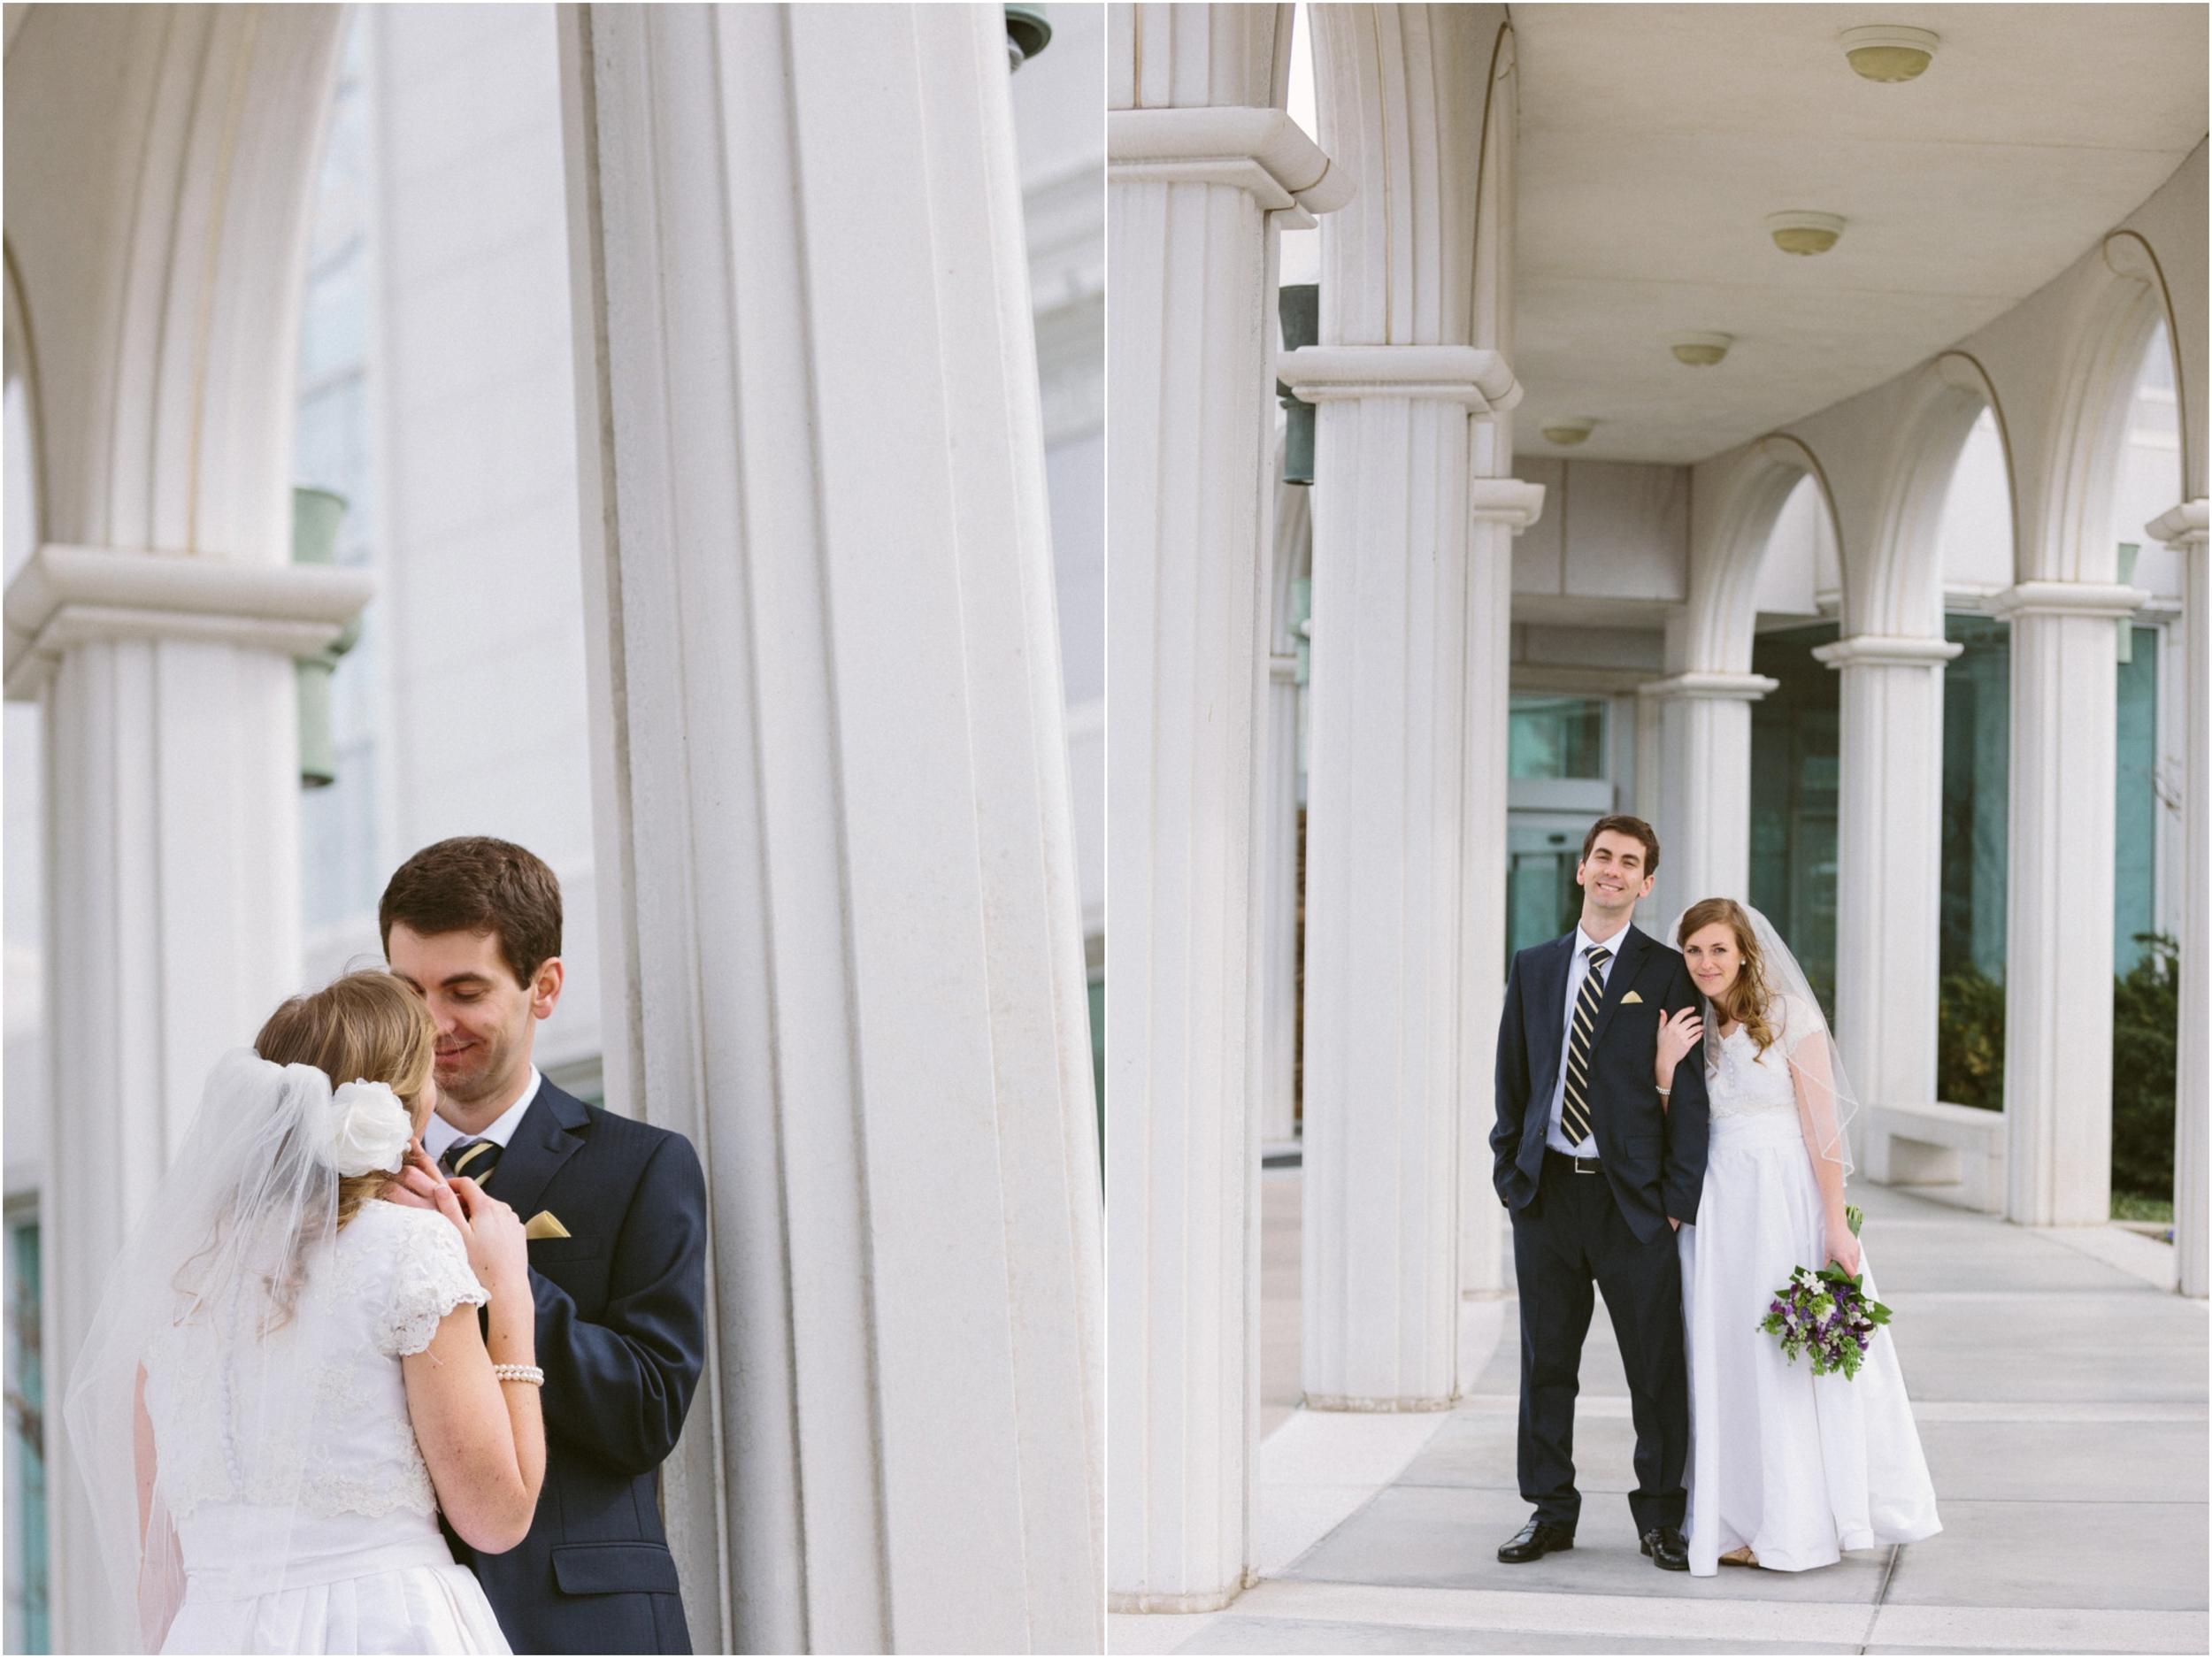 Martins_Wedding_018.jpg